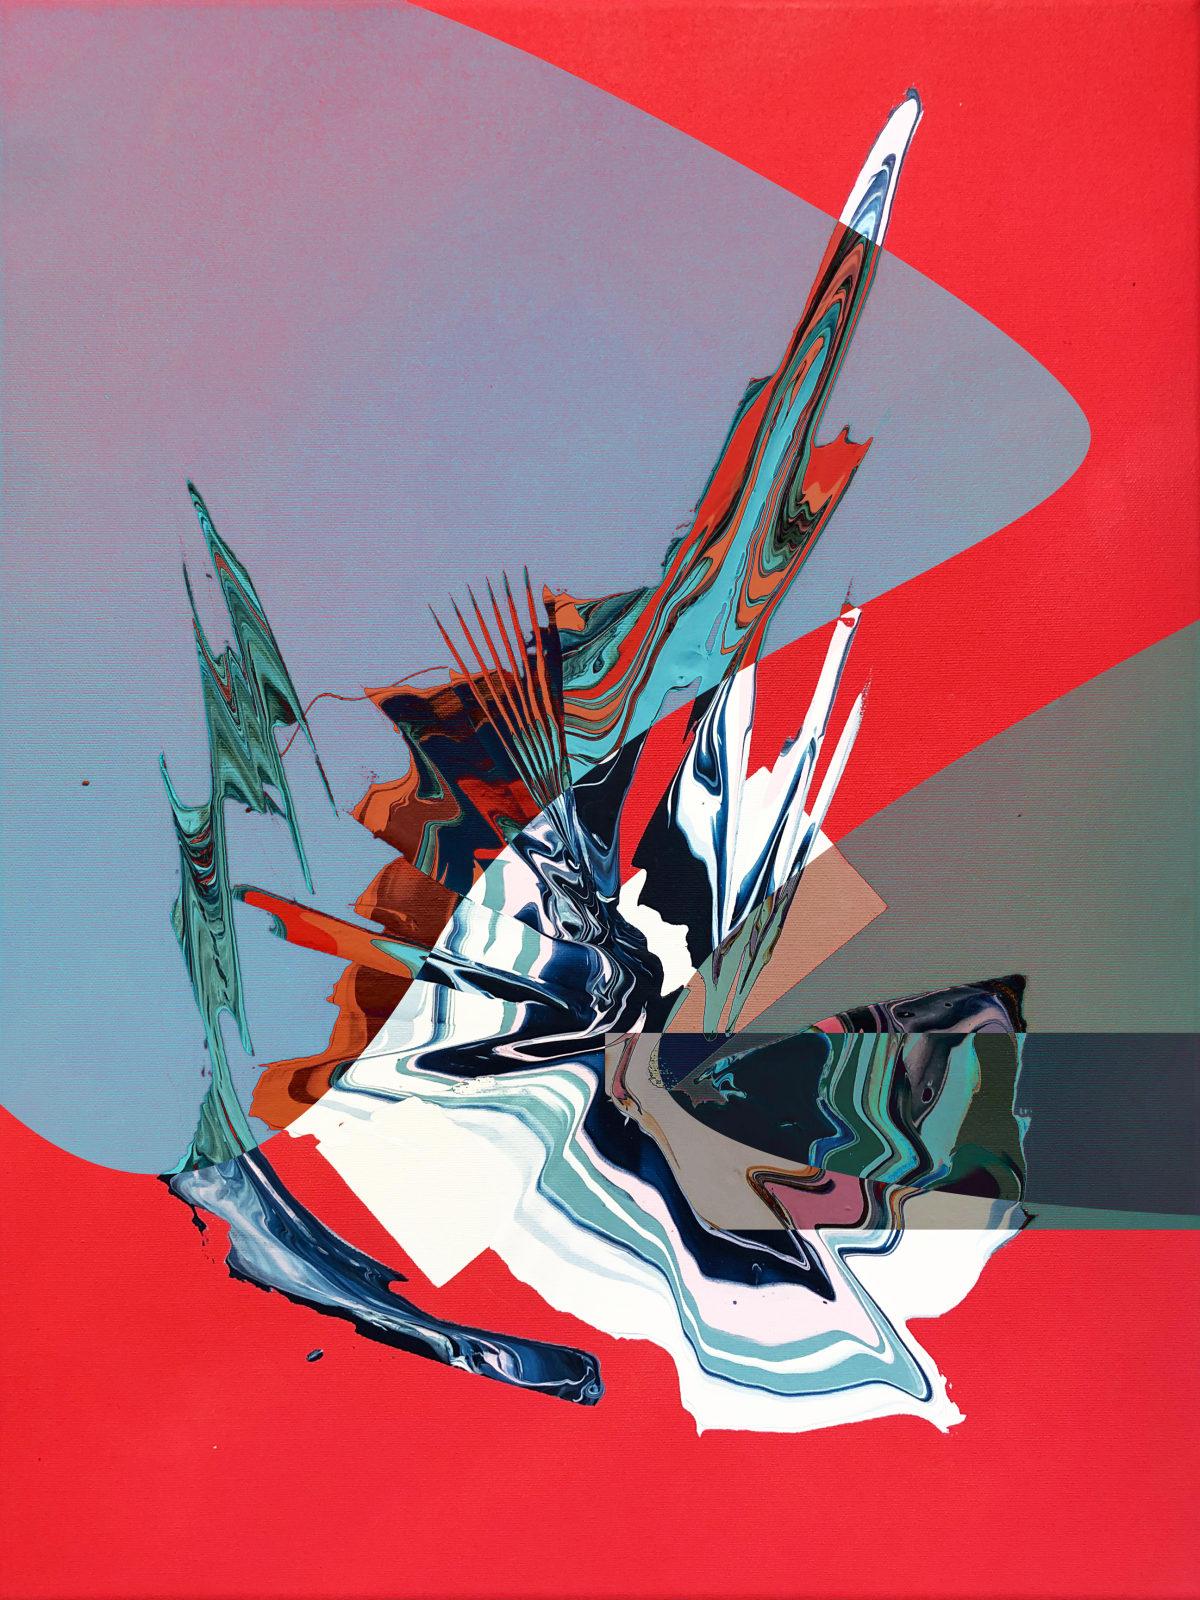 Jay Jermyn Filtration 007, 2019 Acrylic & Spray Paint on Canvas 61 x 45.7 cm 24 1/2 x 18 in